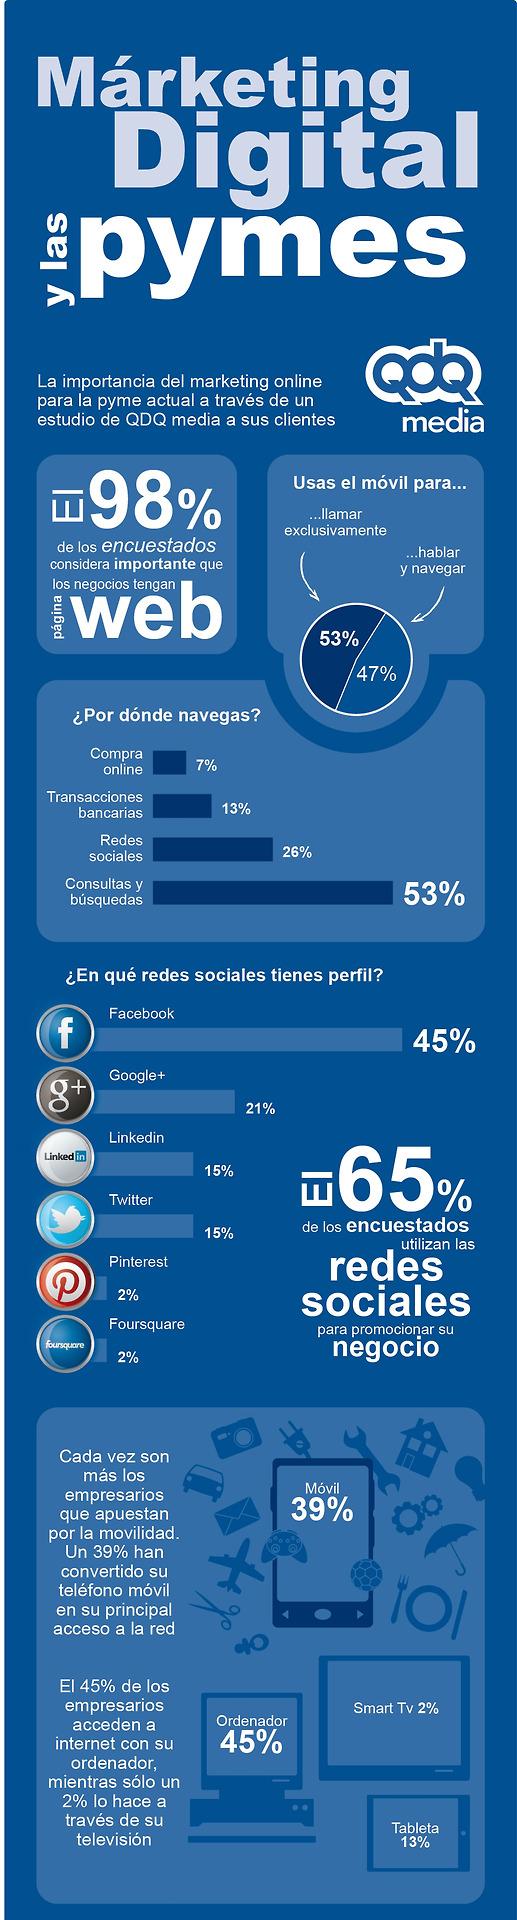 El Marketing digital y Marketing Móvil.